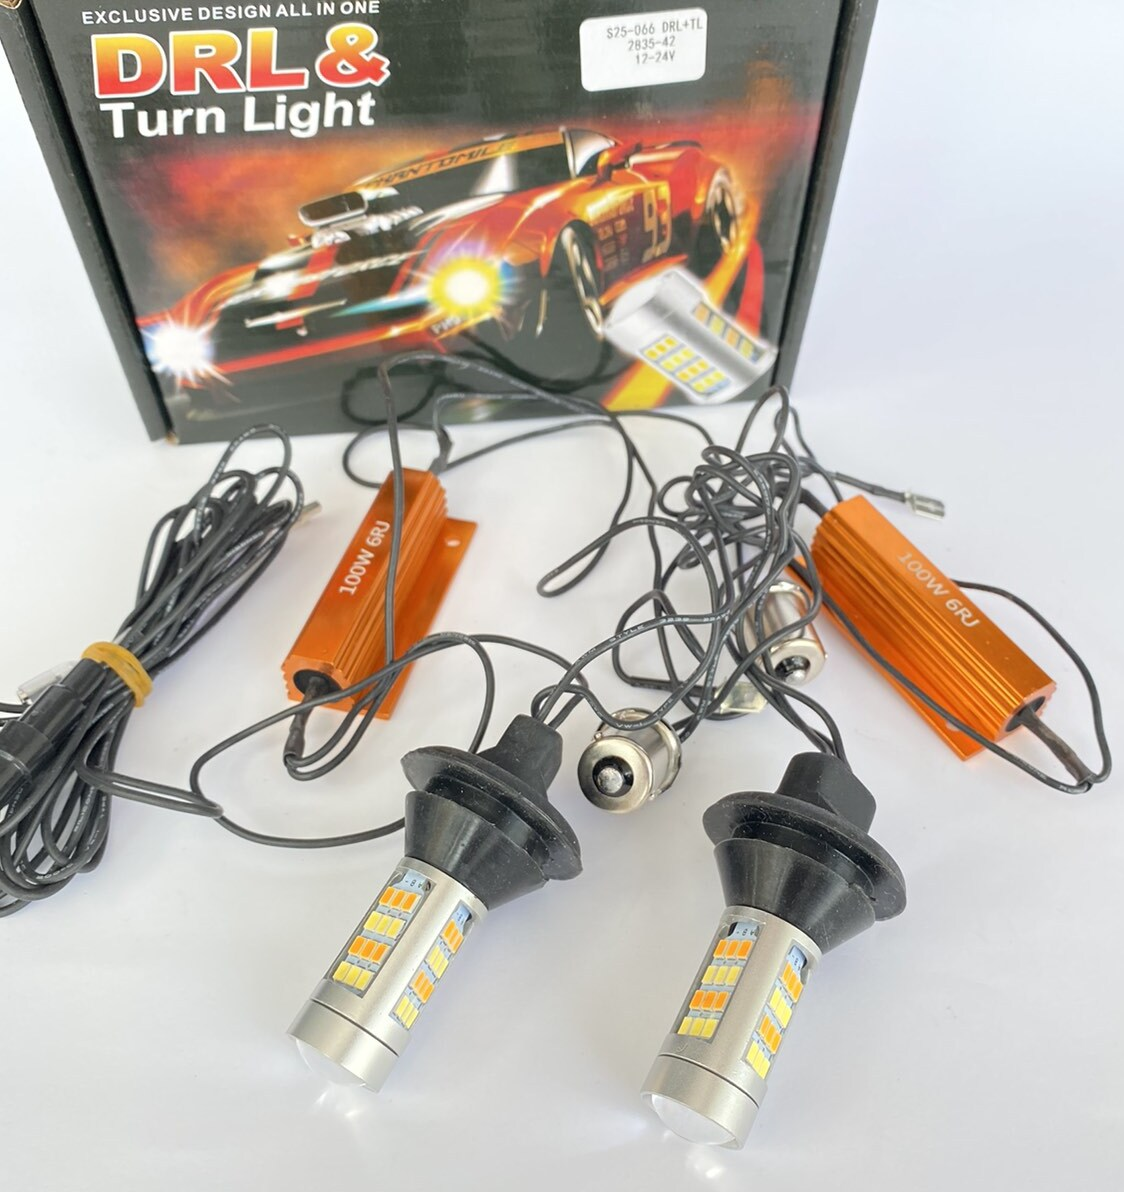 Светодиодная LED лампа ДХО с поворотом + габарит CAN S25-066 DRL+TL 2835-42